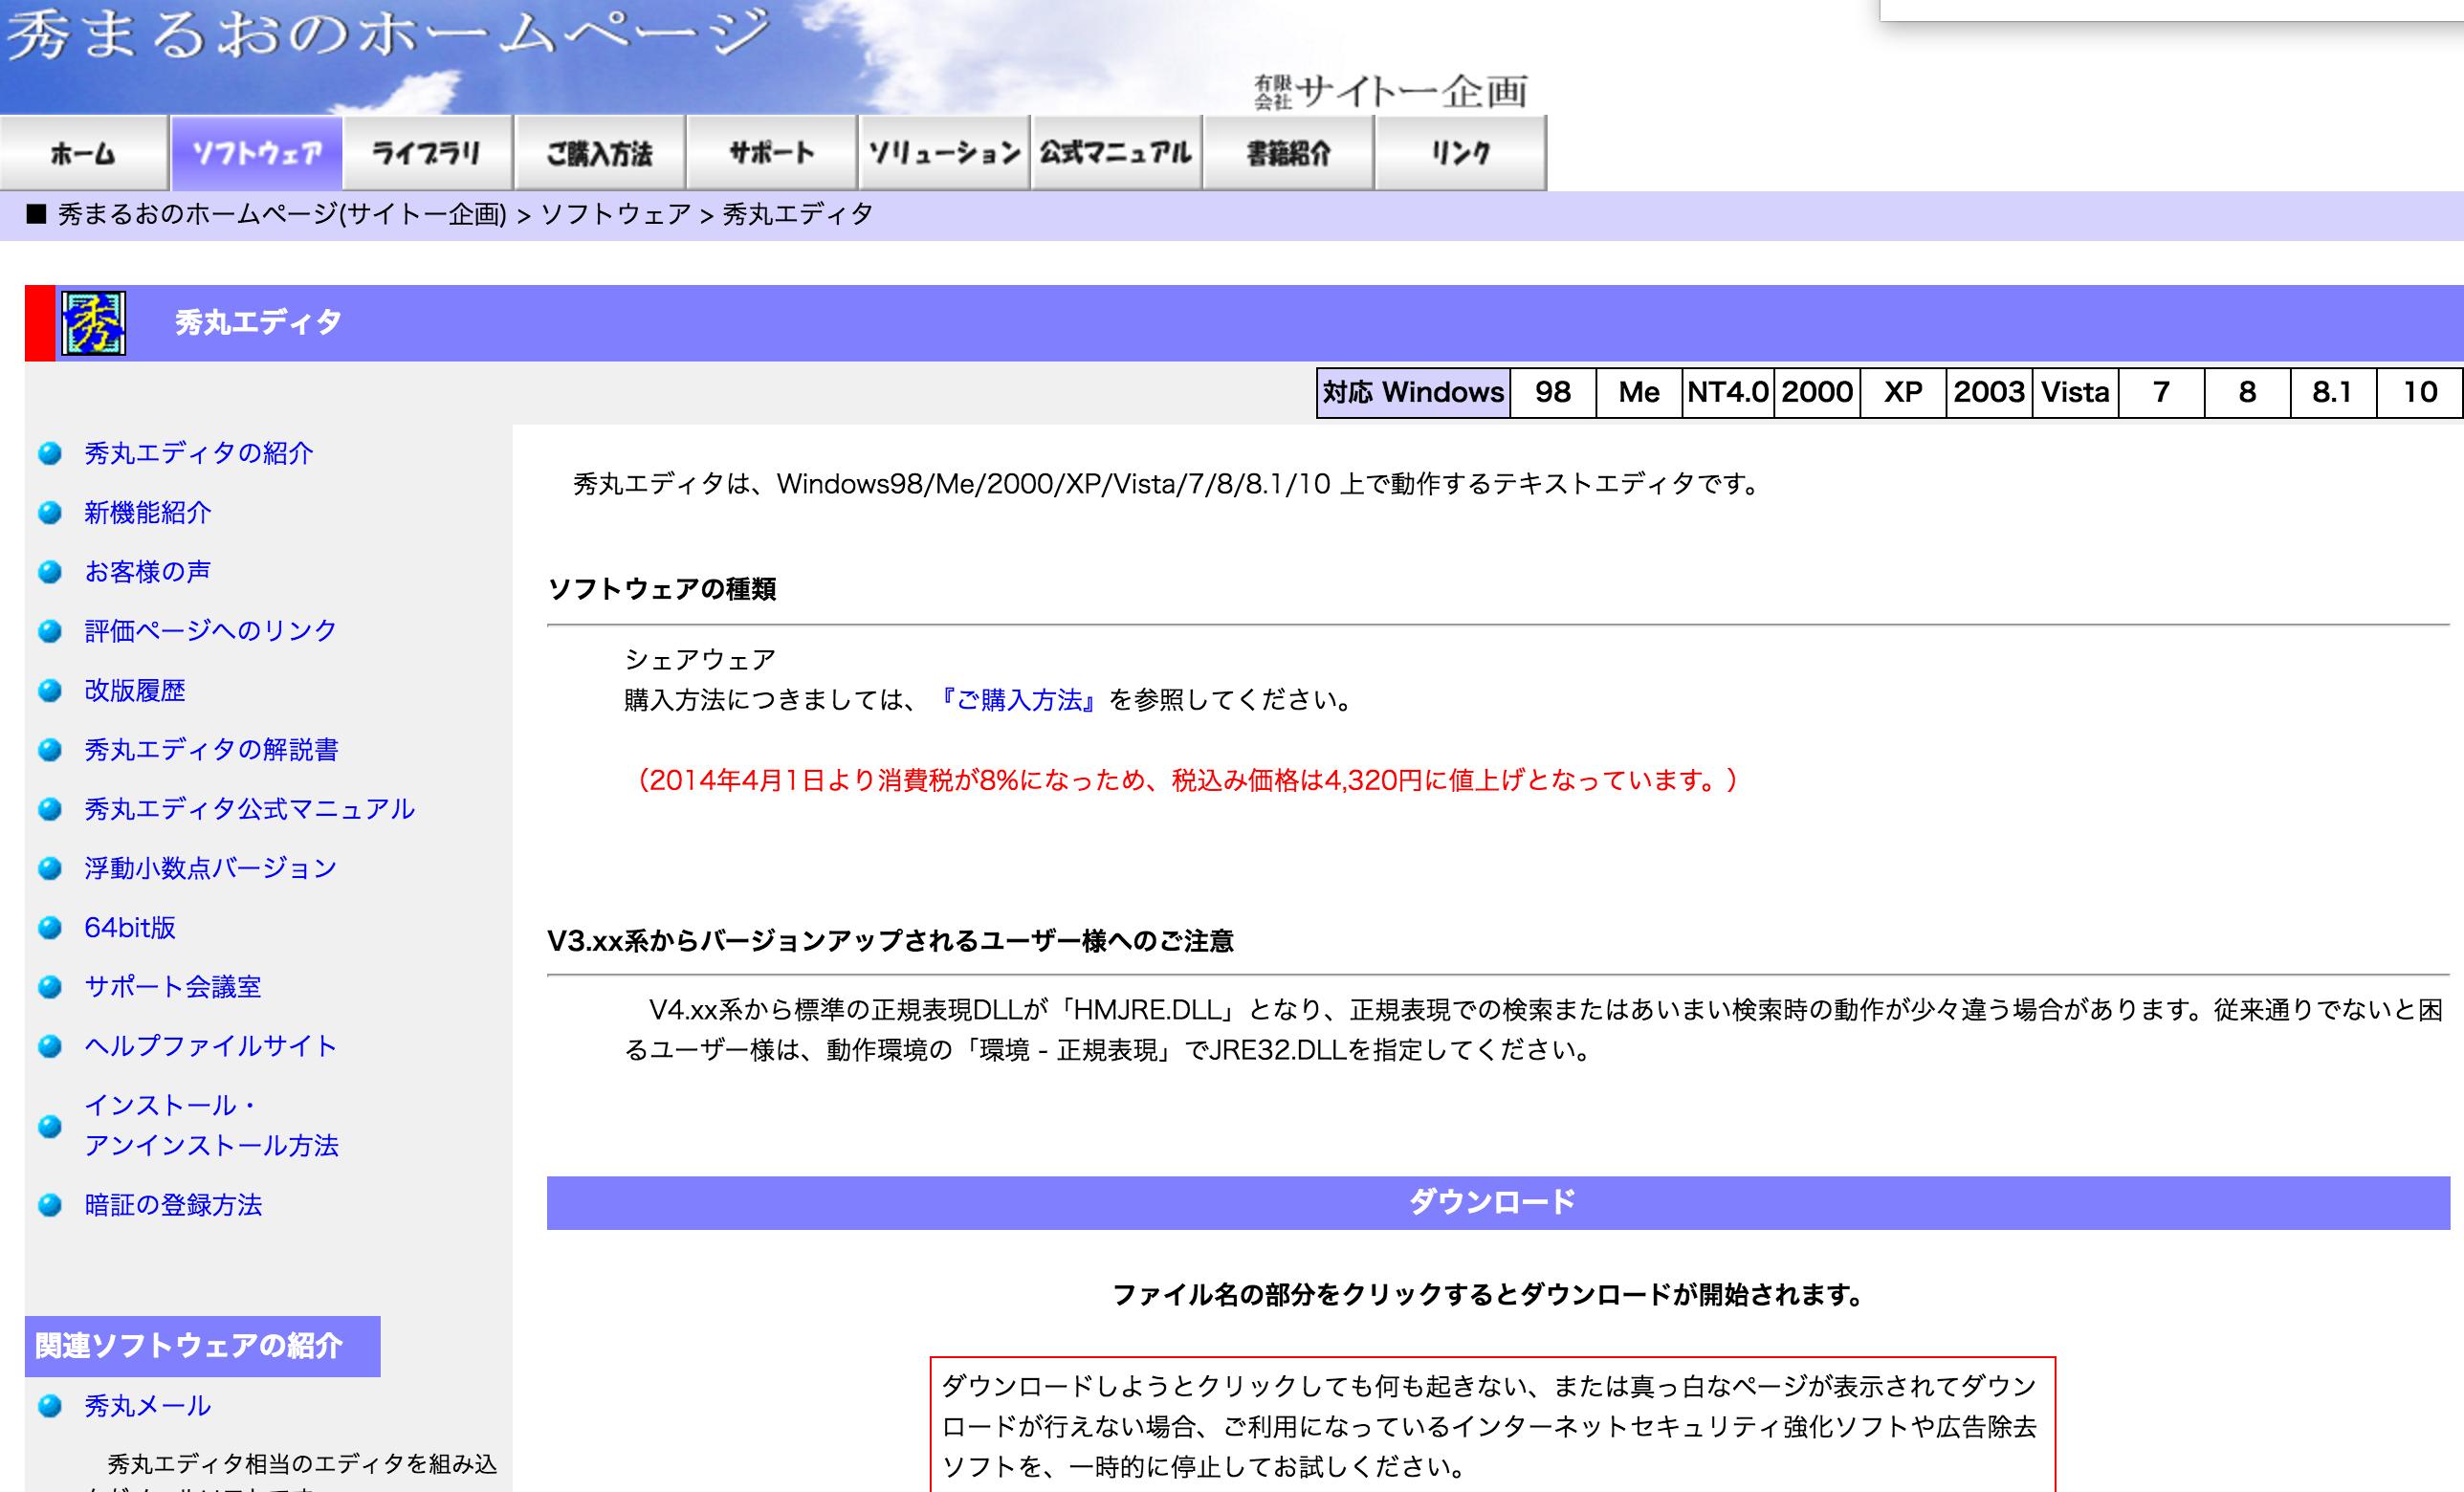 Screenshot 2016-07-25 15.02.12